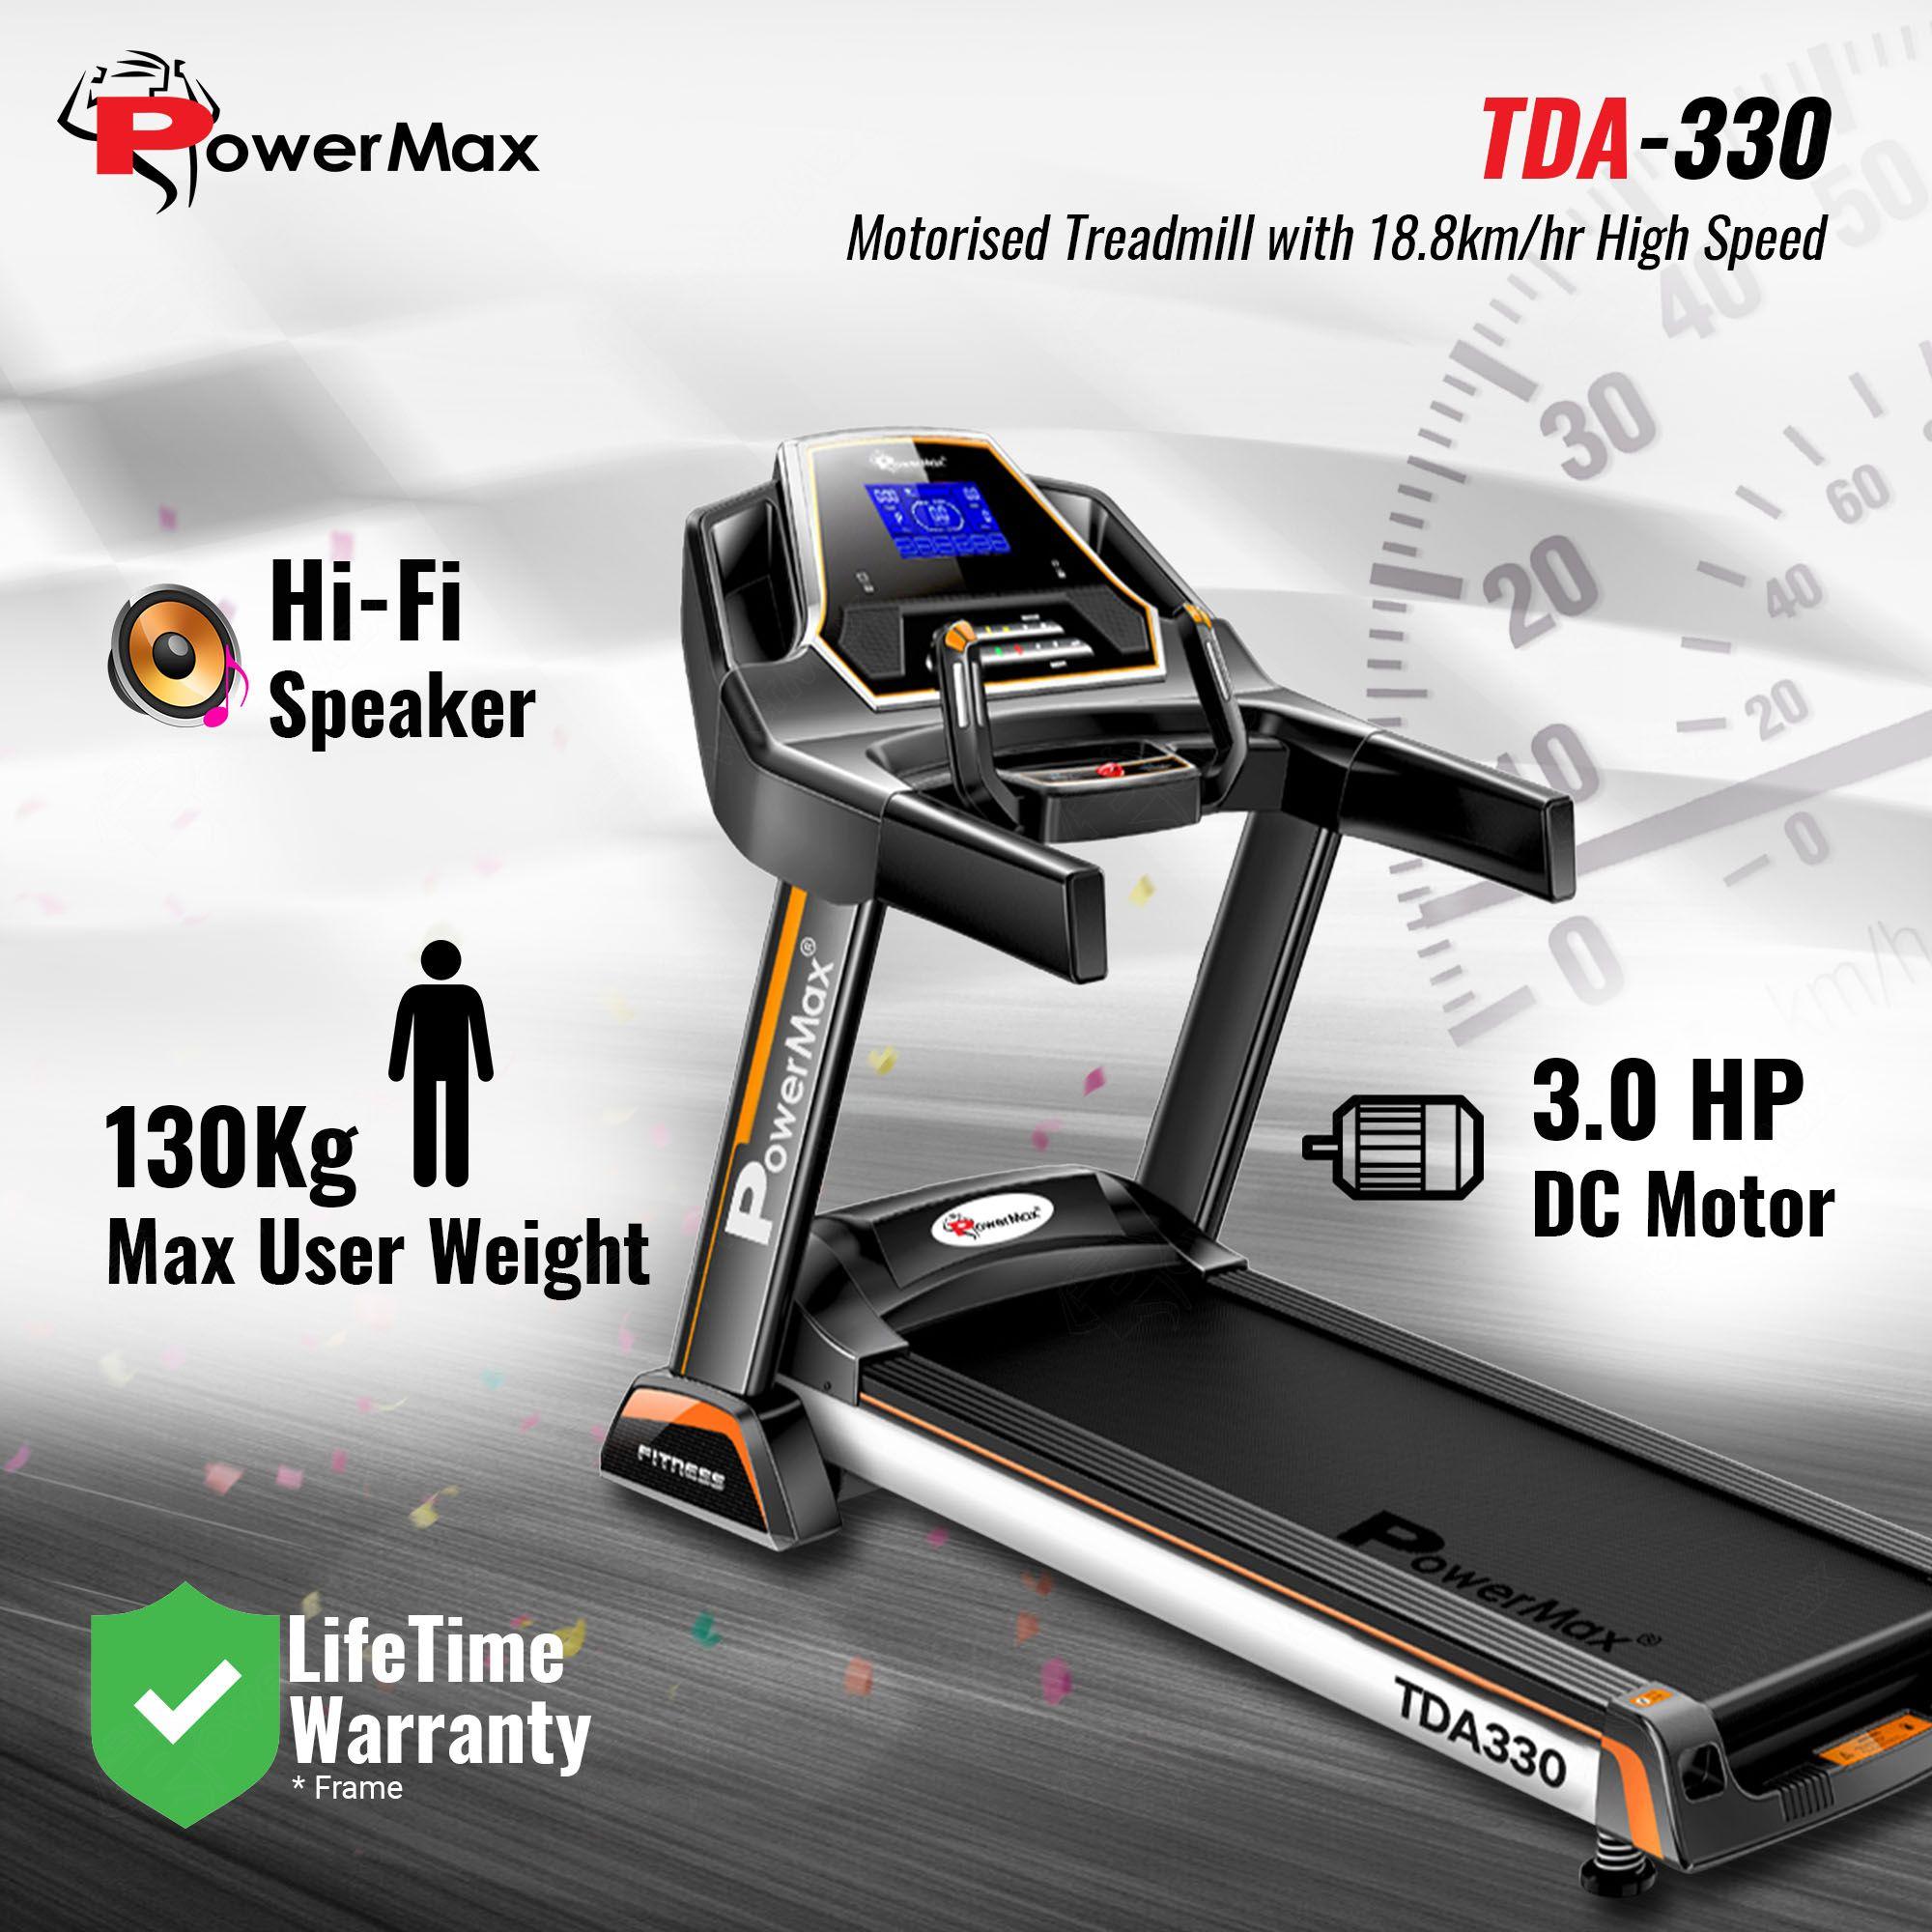 Amazon Spark | Treadmills in 2019 | Commercial treadmills